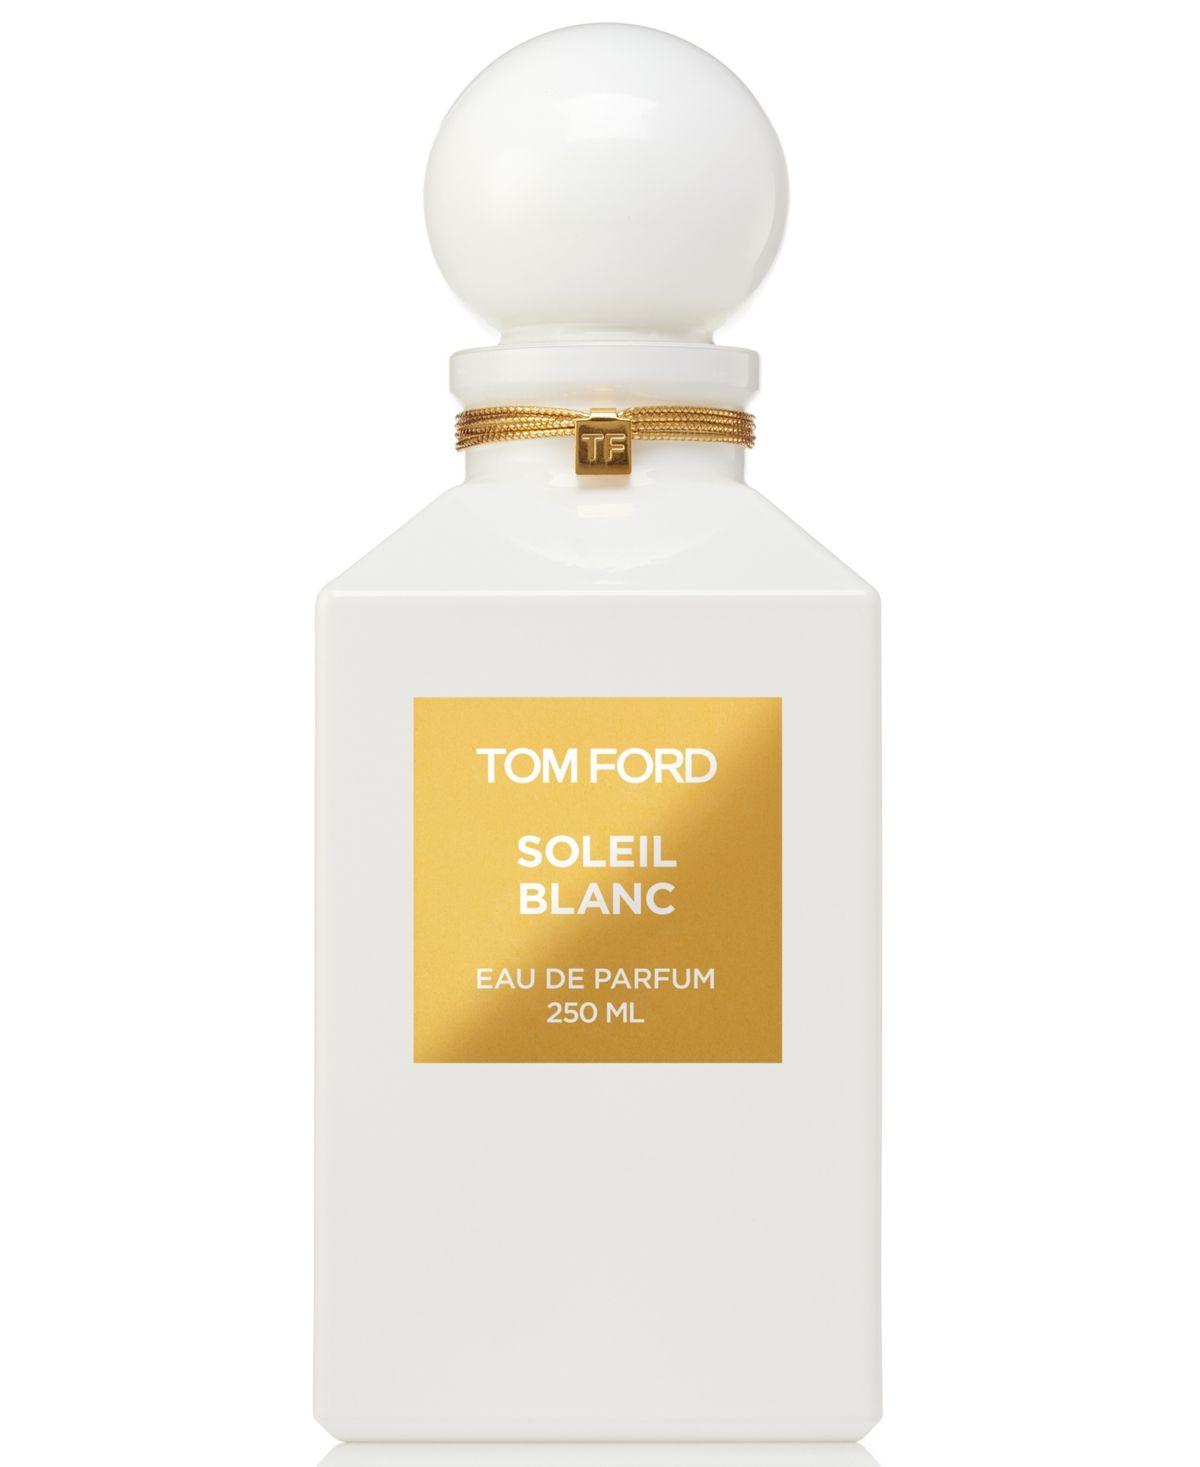 Tom Ford Soleil Blanc Eau De Parfum 8 4 Oz Perfume Fragrance